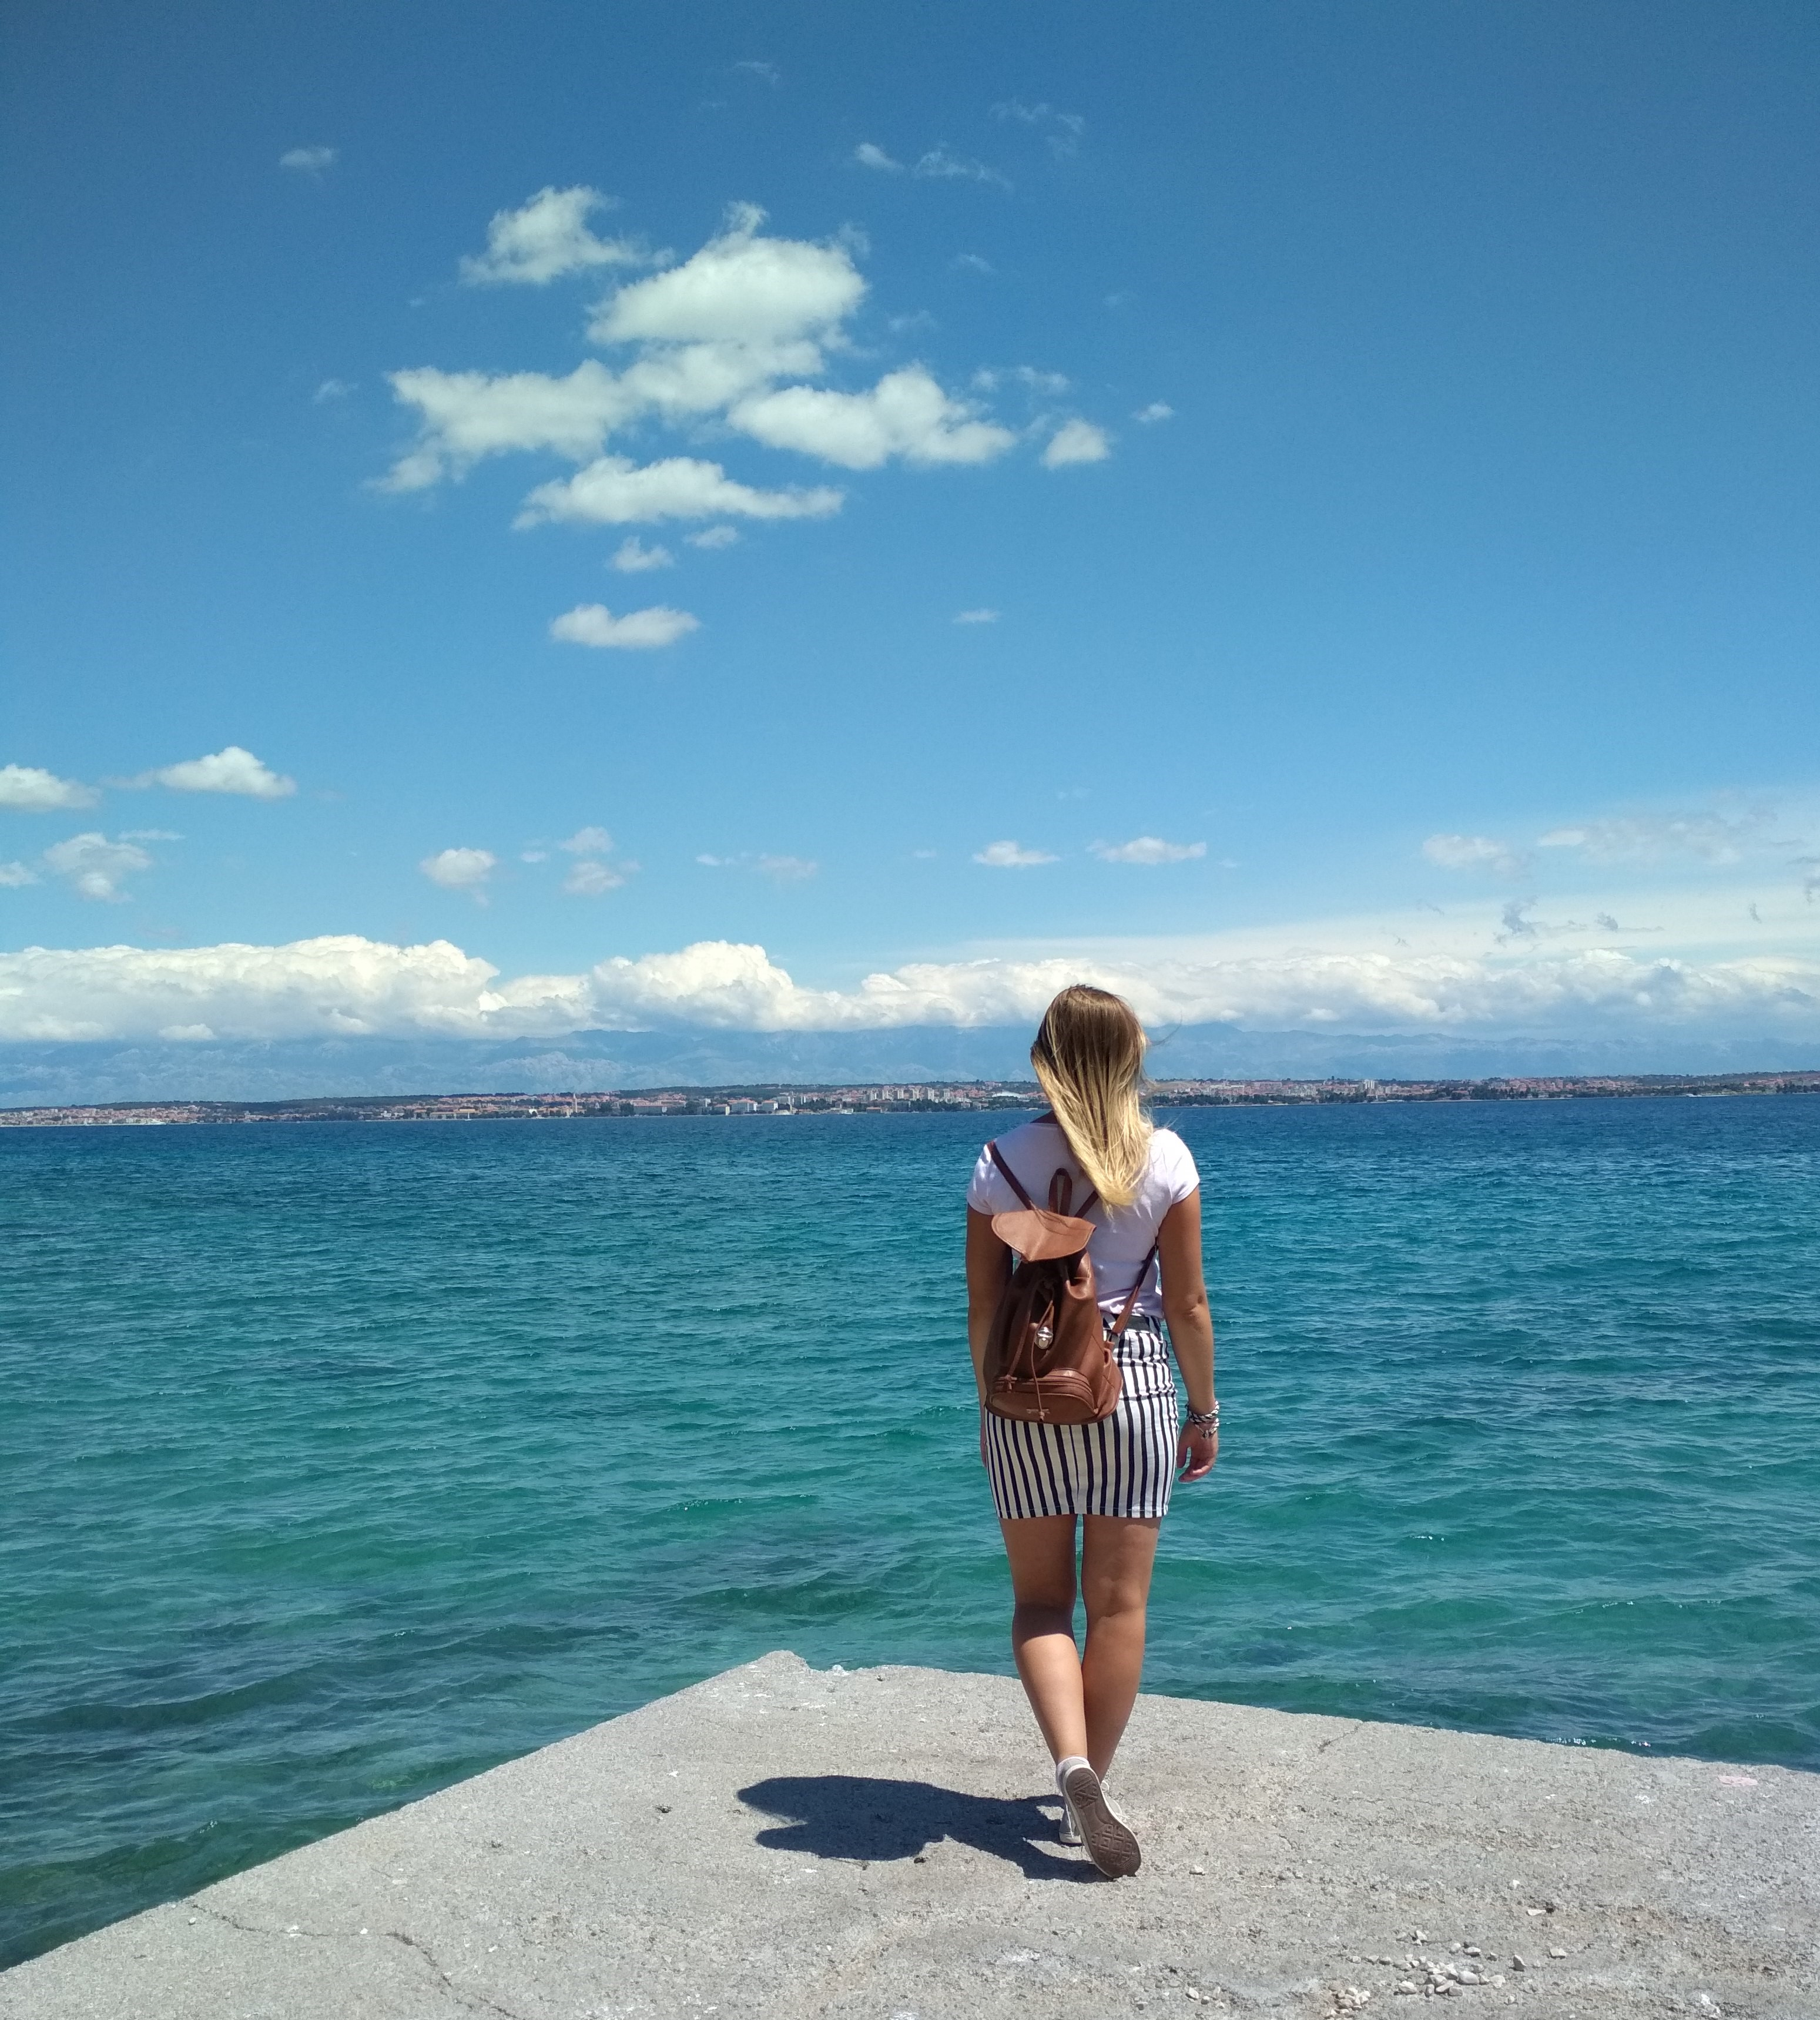 Agnieszka walking around Ugljan island in Croatia, a Balkan country